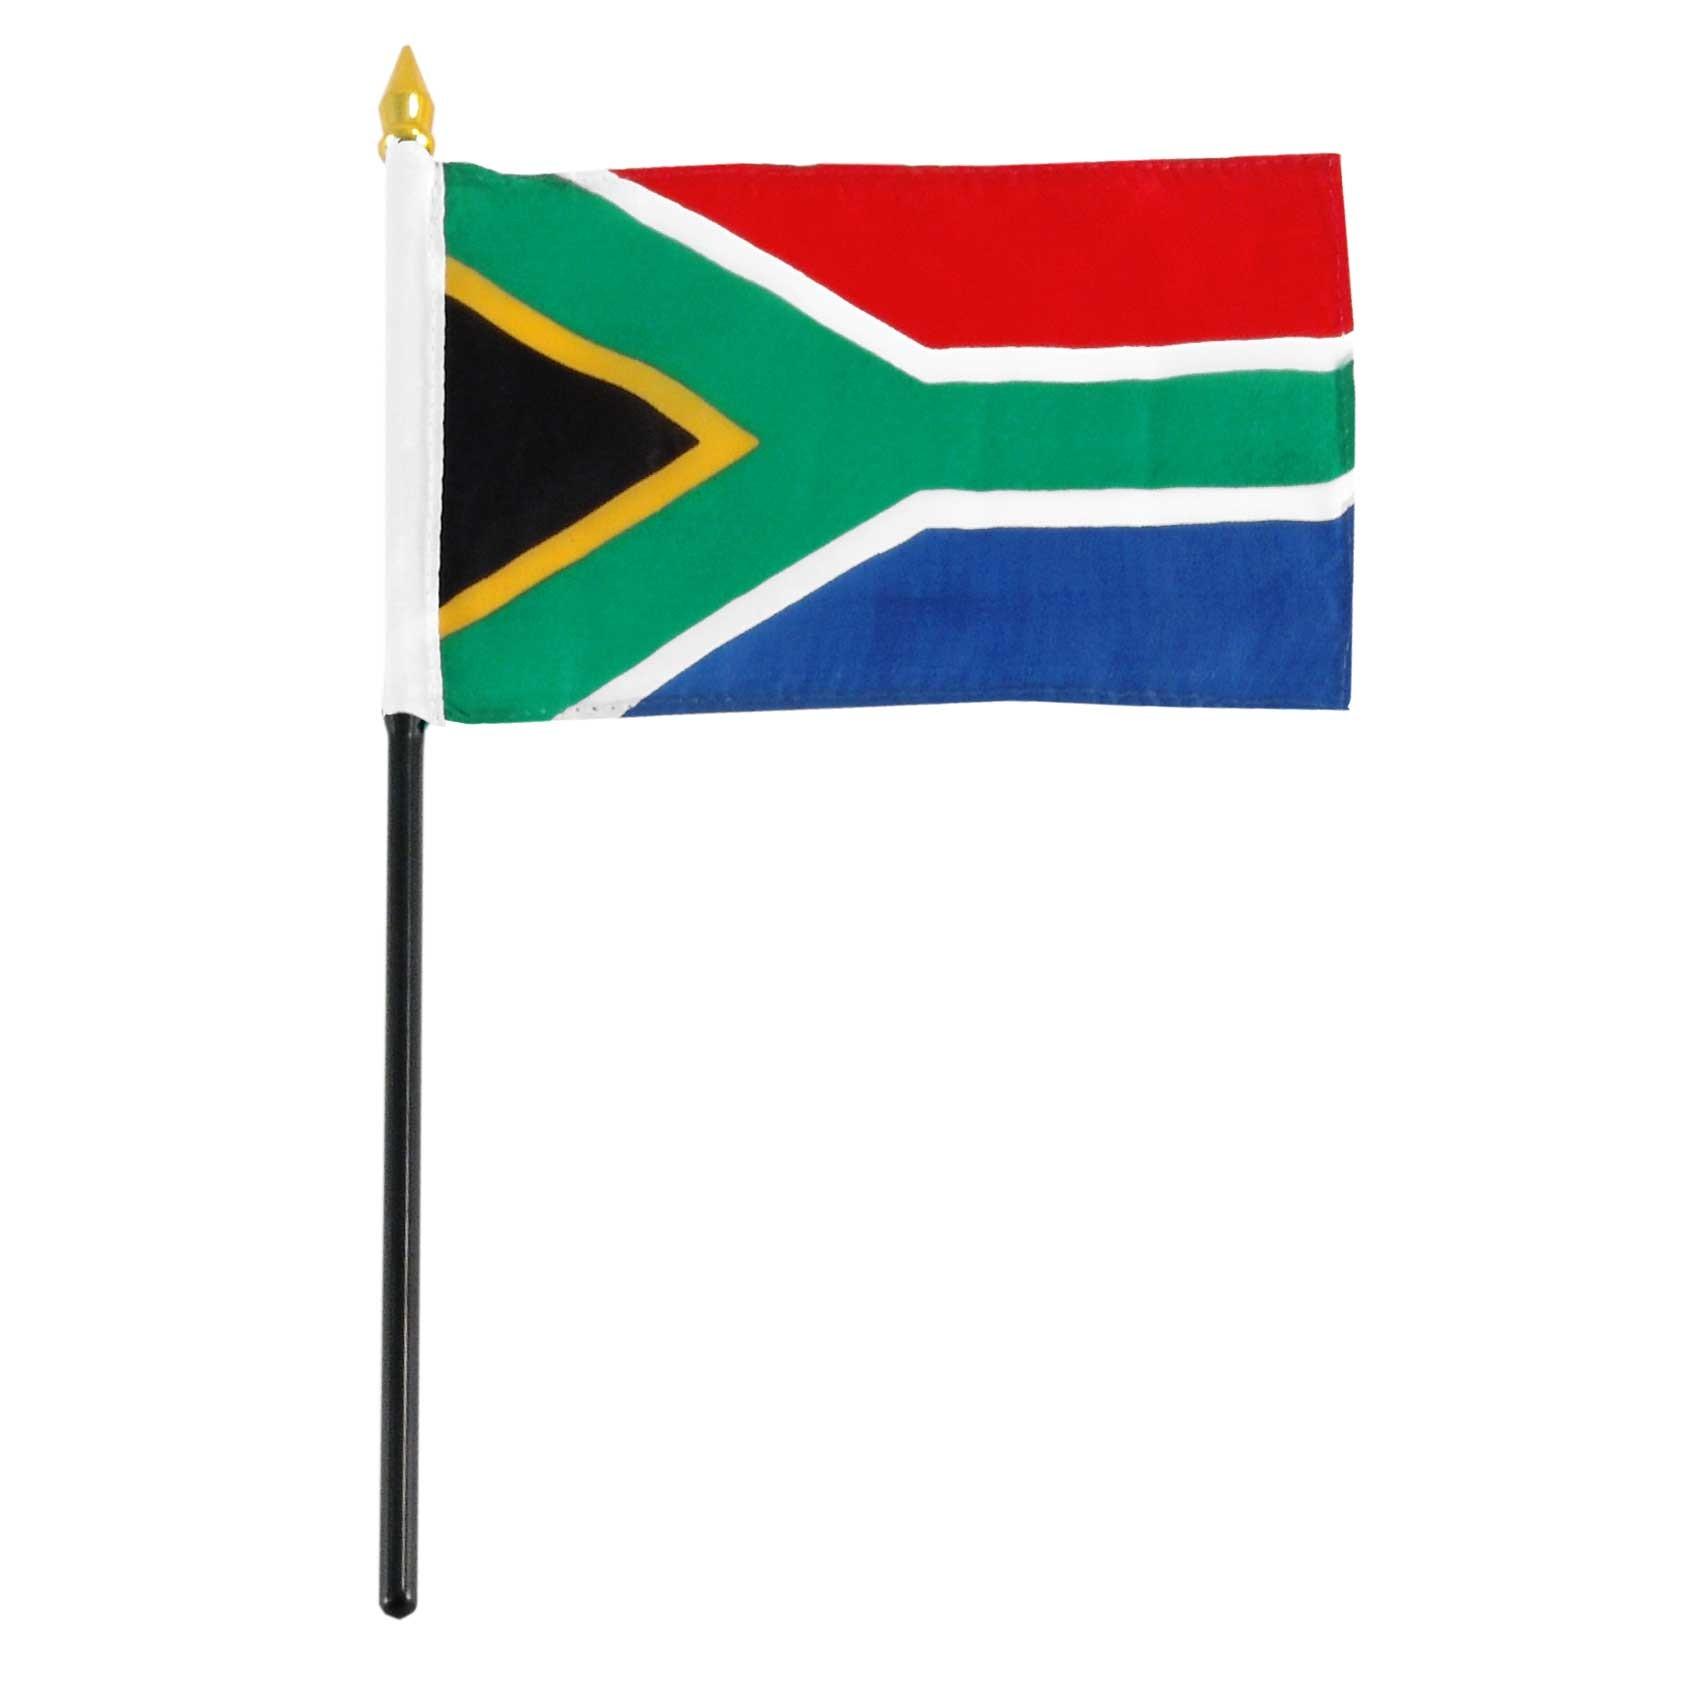 clip art south africa - photo #16